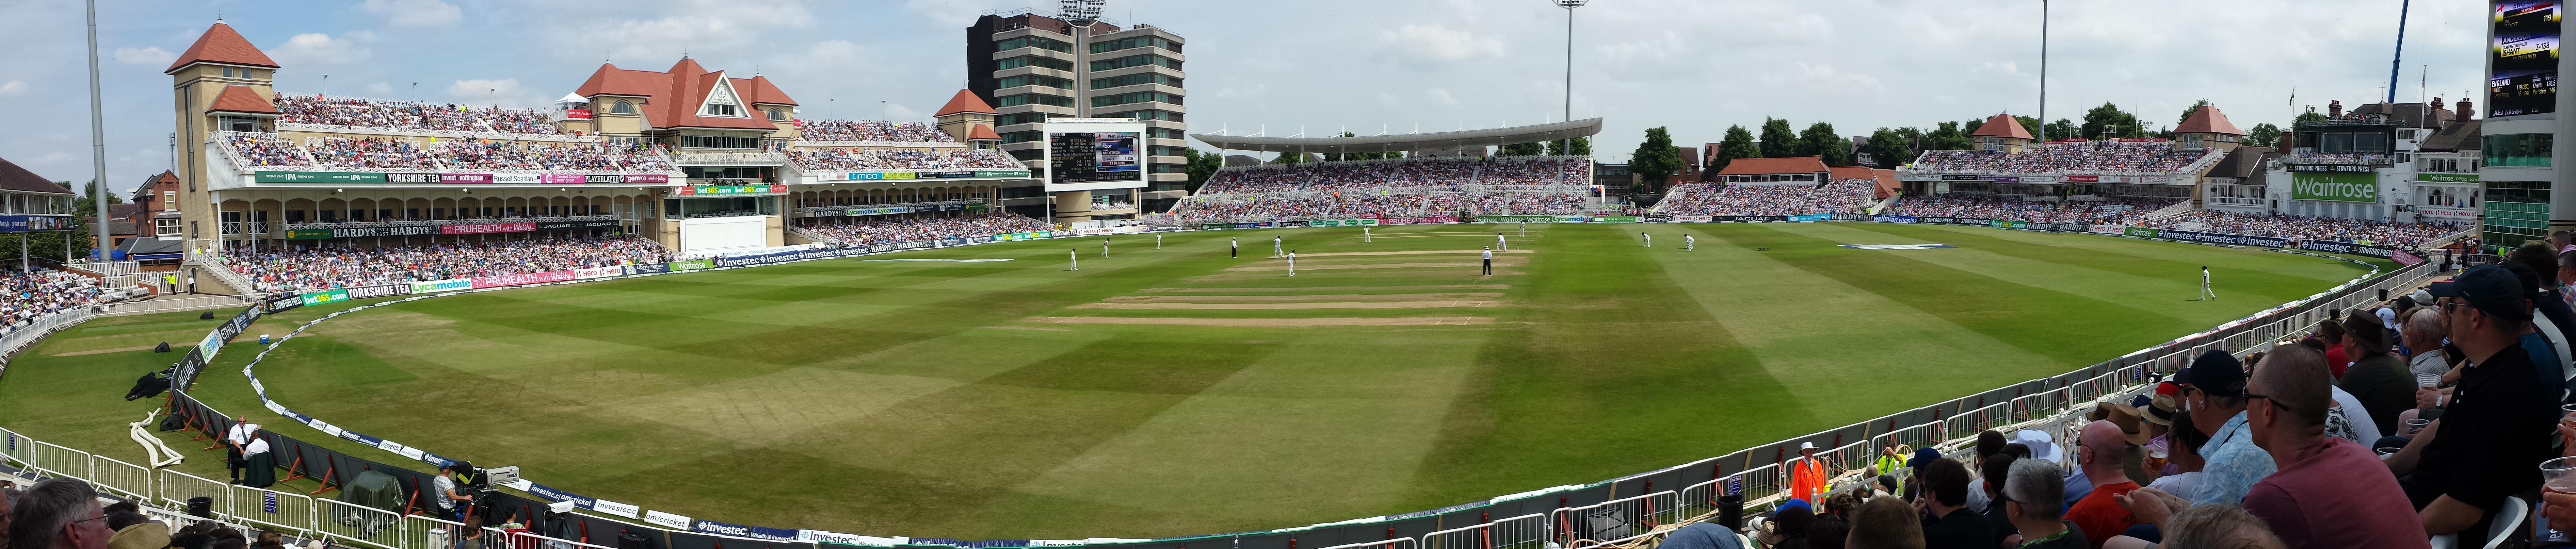 Trent Bridge cricket ground England v India